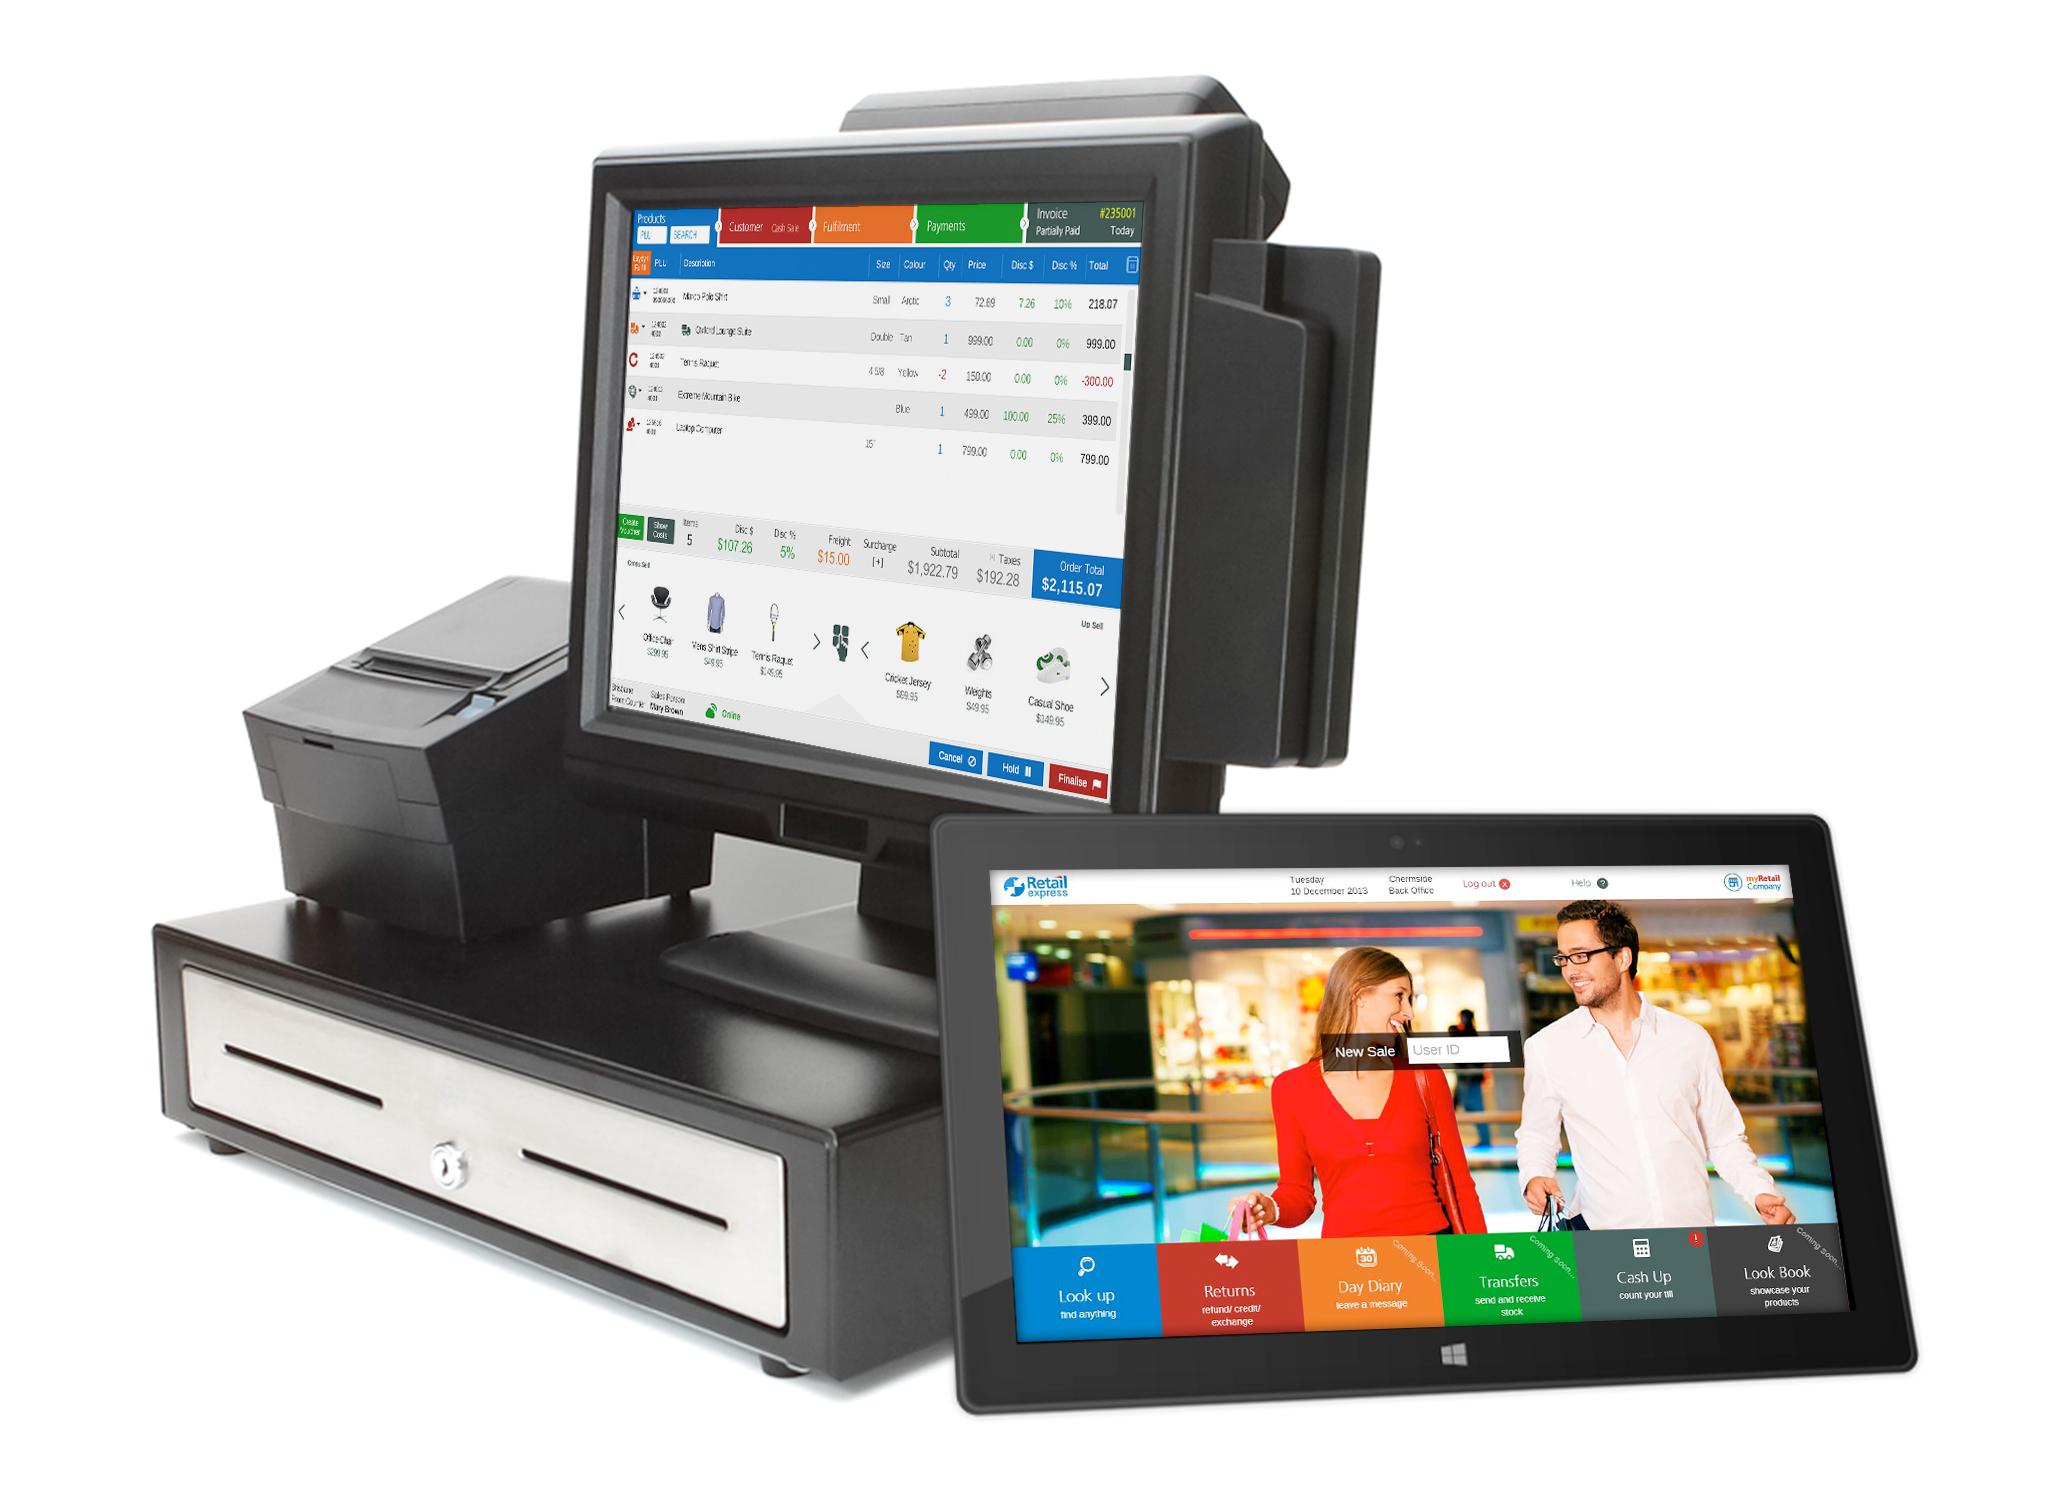 Retail Express Software - Retail Express POS Screen %>